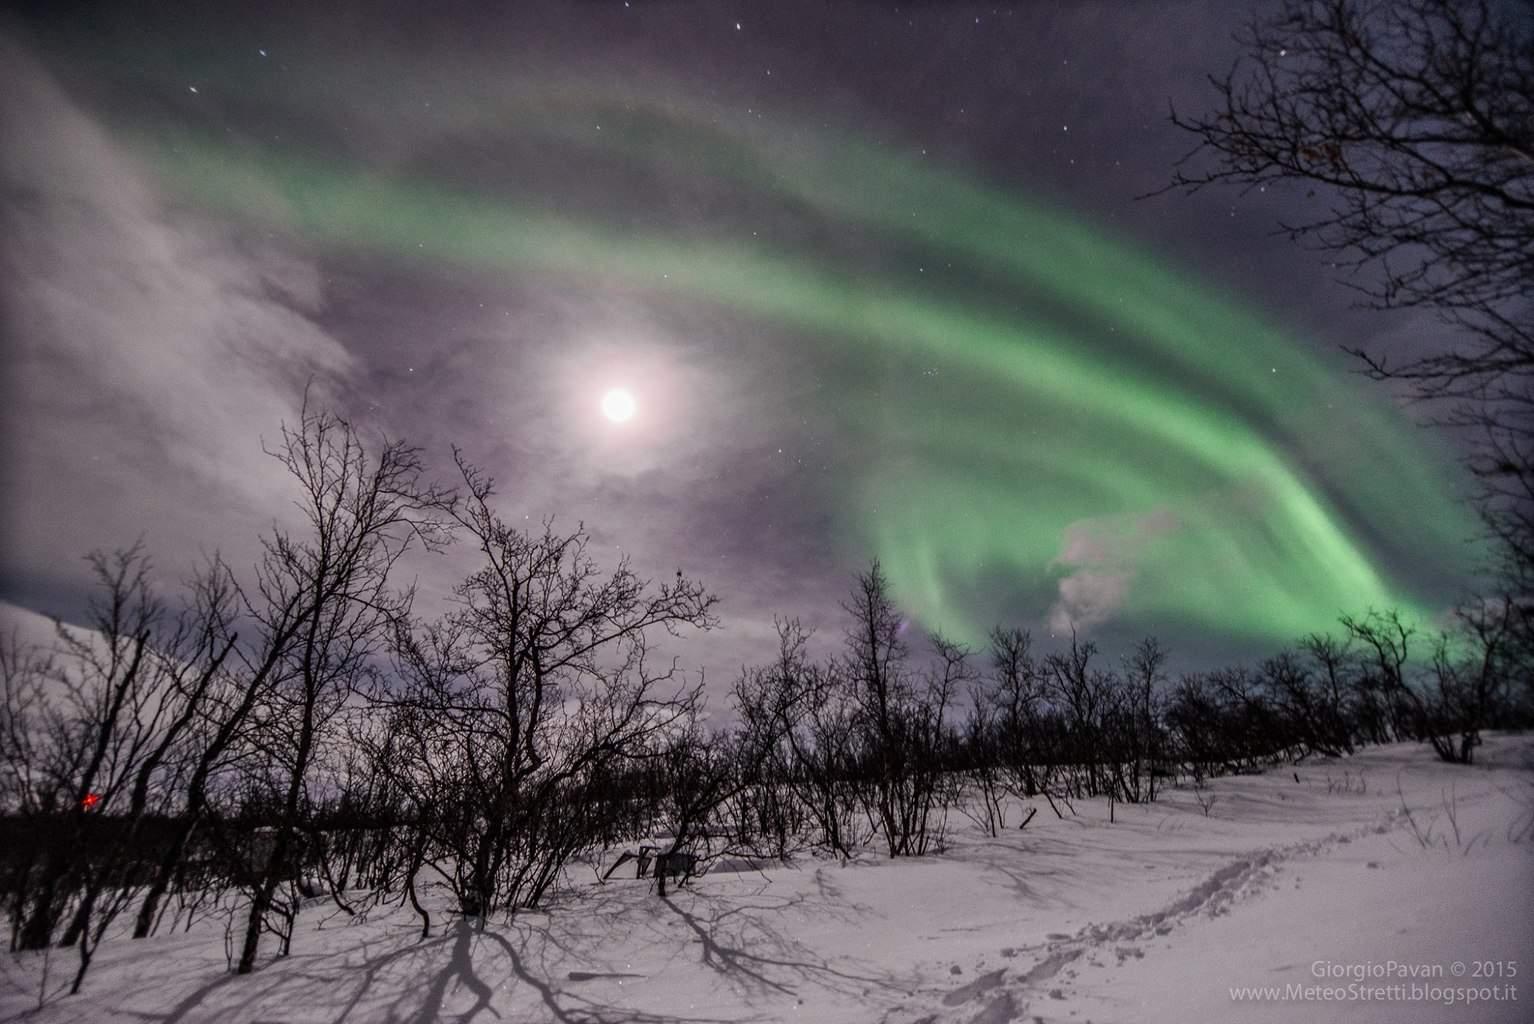 Great aurora display over Swedish Lapland on Jan 30, 2015.